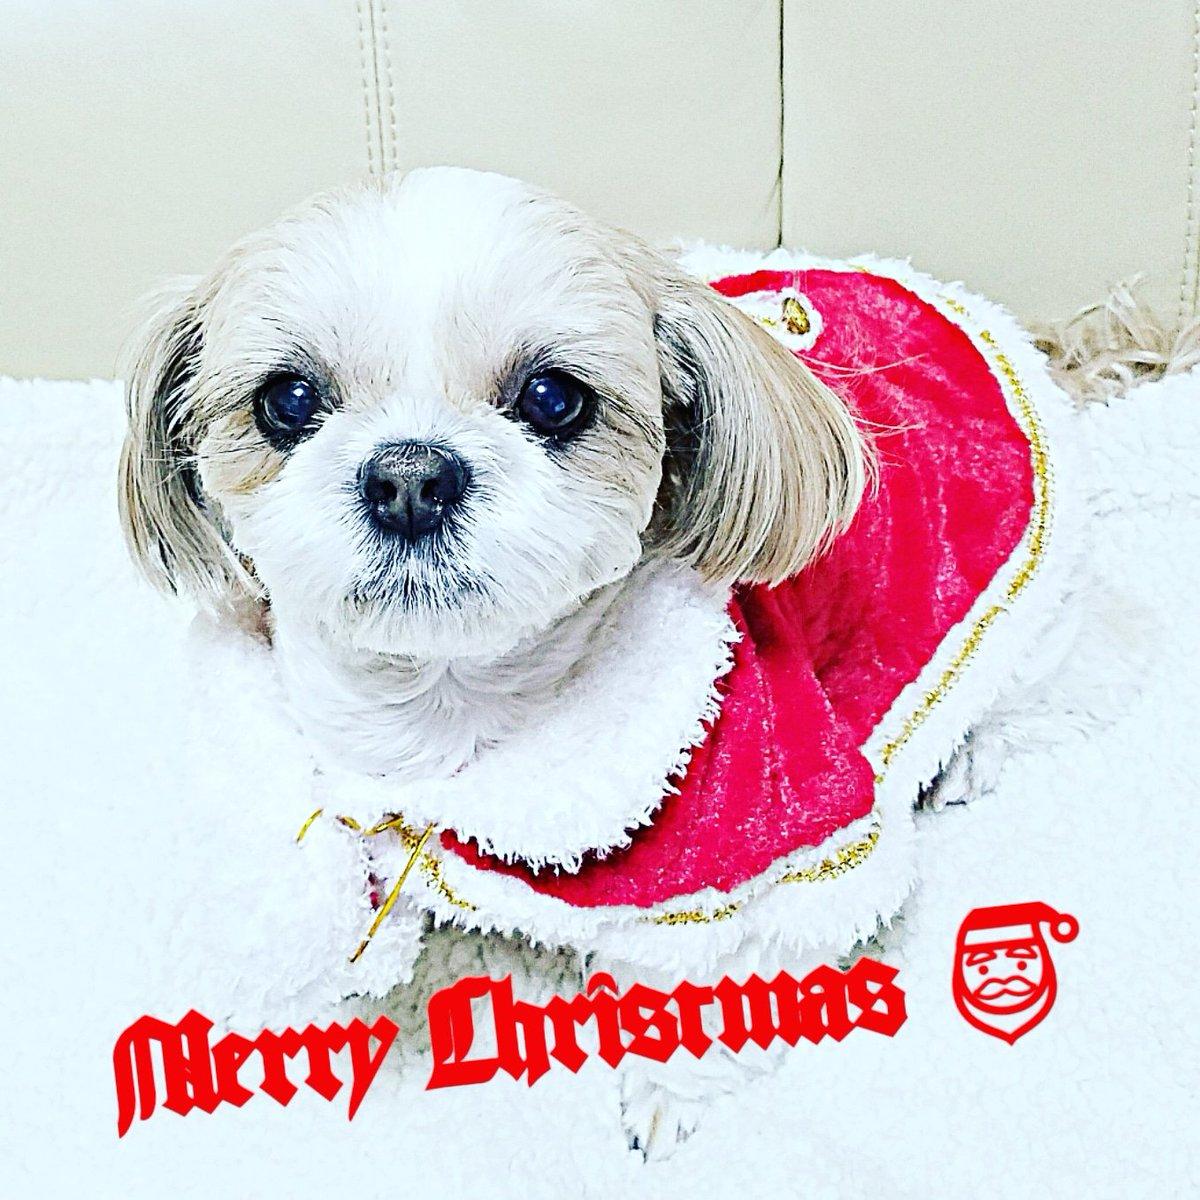 Merry Christmas all my friends   #犬 #犬好きな人と繋がりたい  #christmas #merrychristmas  #犬バカ部 #ふわもこ部 #鼻ぺちゃ犬 #シーズー #シーズー大好き部 pic.twitter.com/qWiQpkB9bt